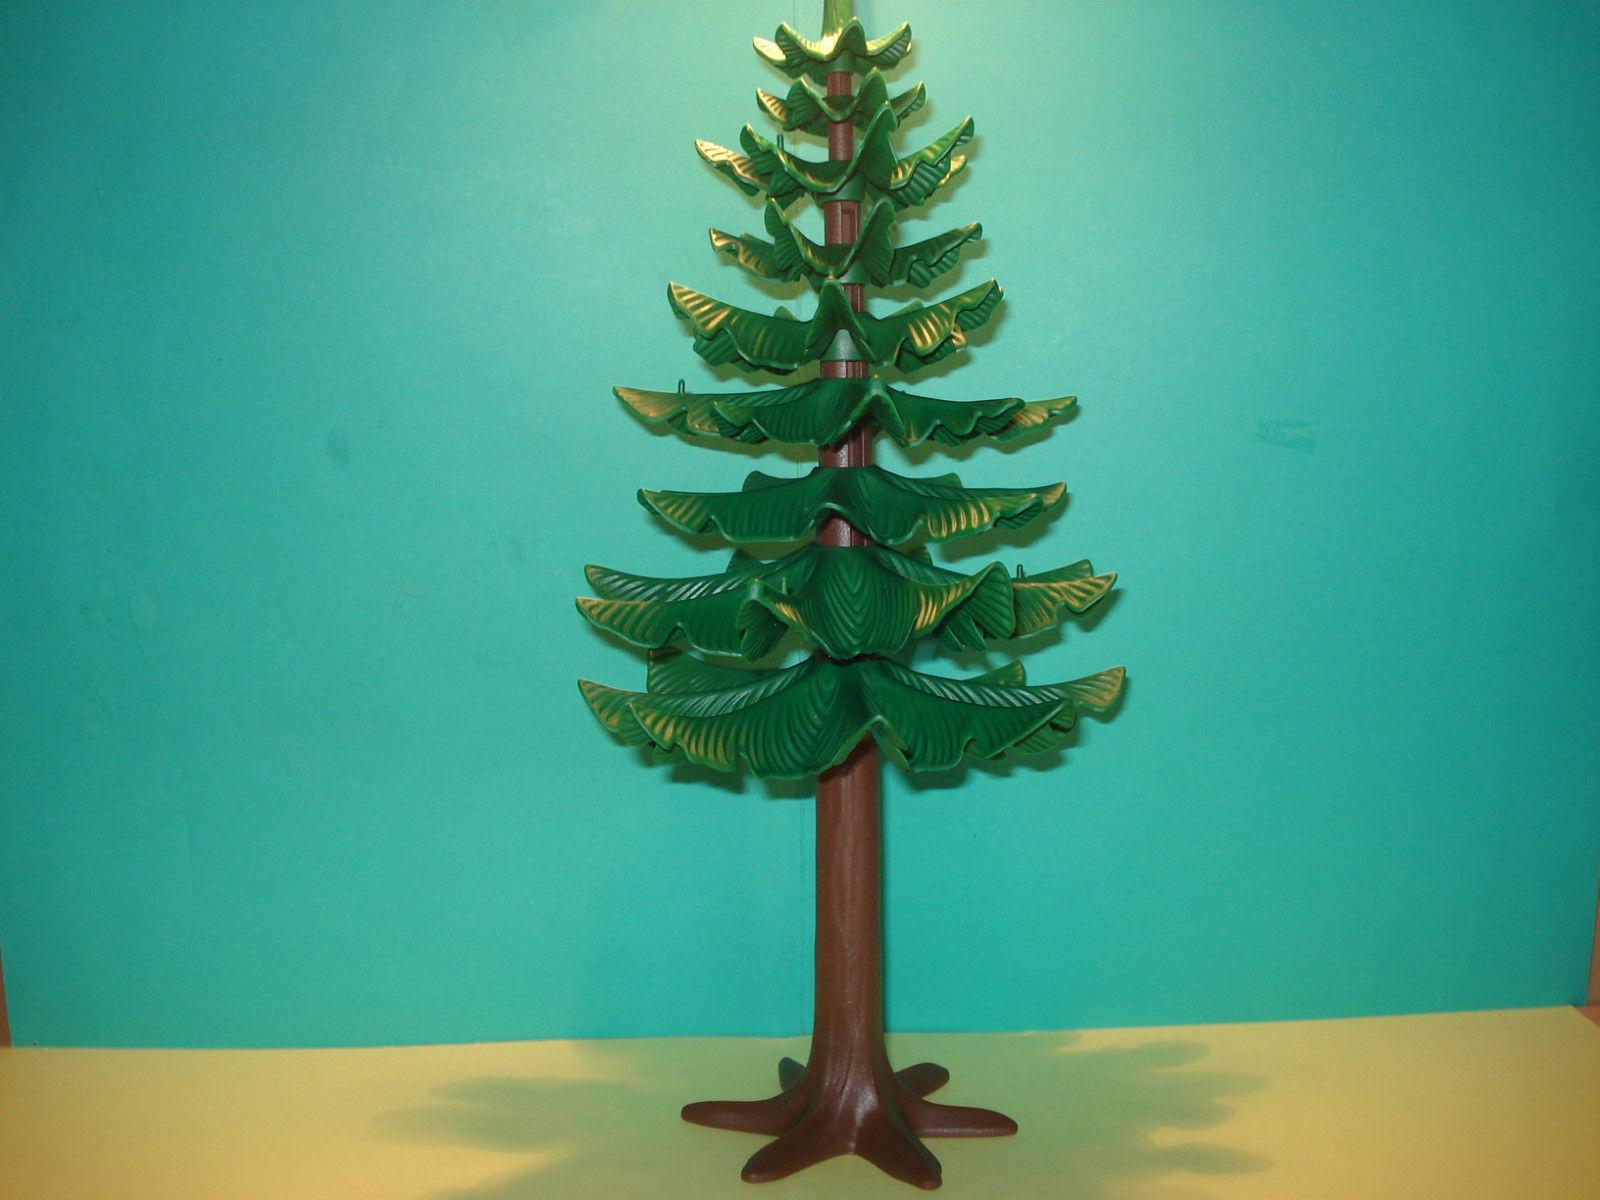 GROßE PLAYMOBIL PINES TANNE, 30 CM, BAUM, TANNE, PINES TREE, ARBRE ¡ZUSTAND NEU e677ac